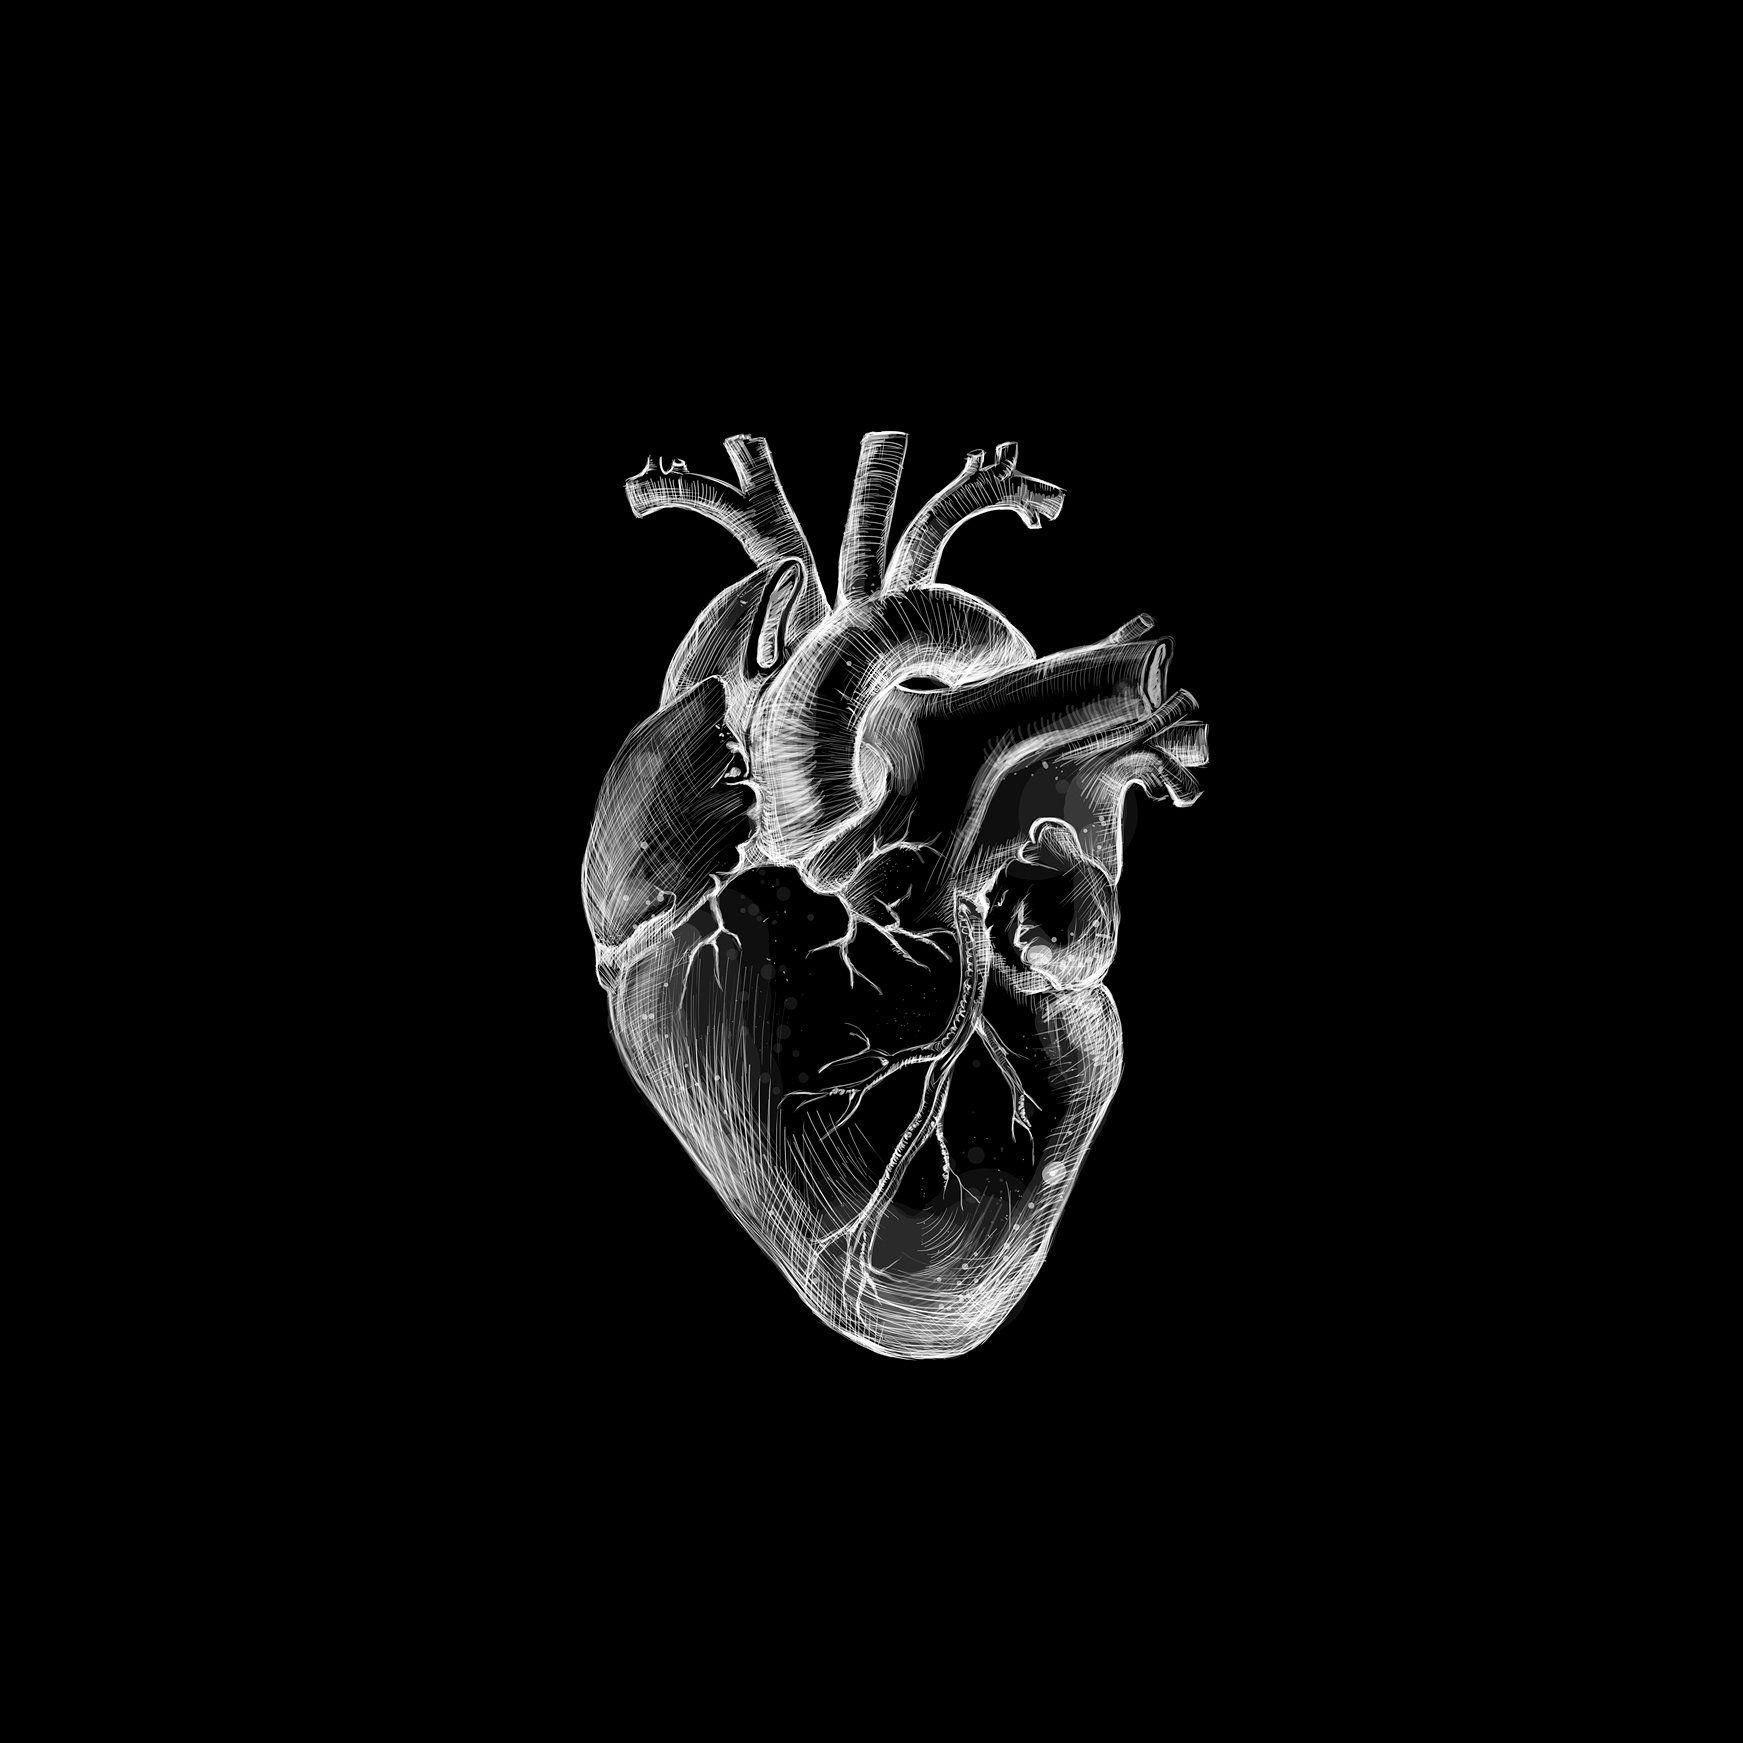 Black Heart Black Aesthetic Wallpaper Dark Wallpaper Iphone Black Heart